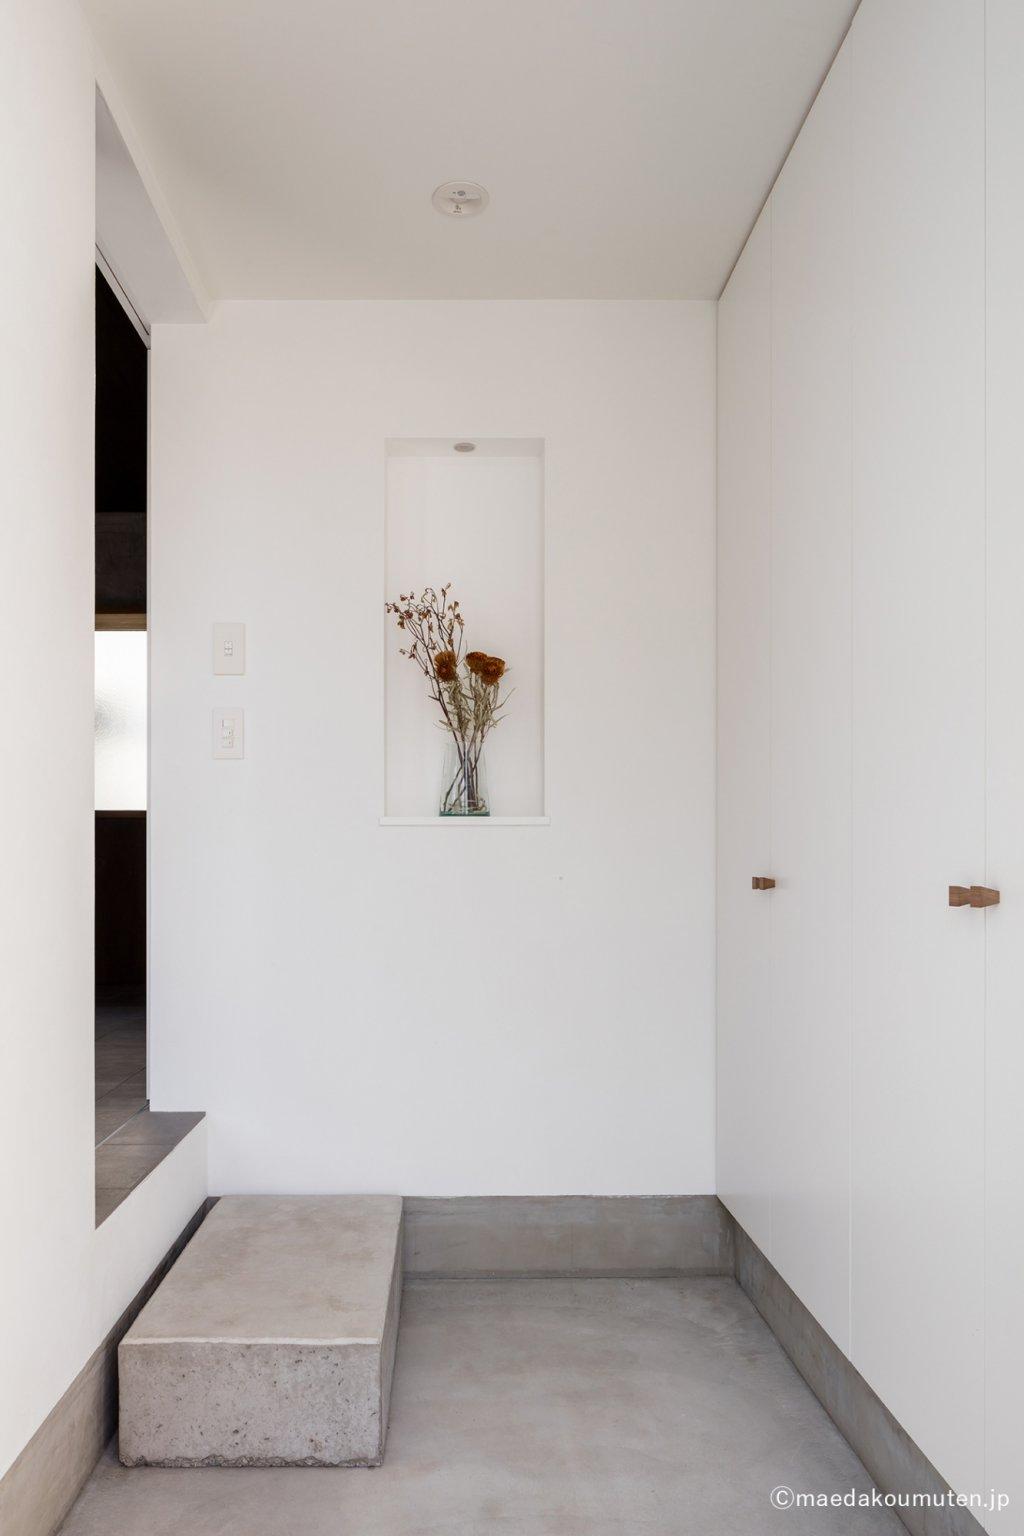 神奈川、工務店、注文住宅、デザイン住宅、建築家、大島の家、09